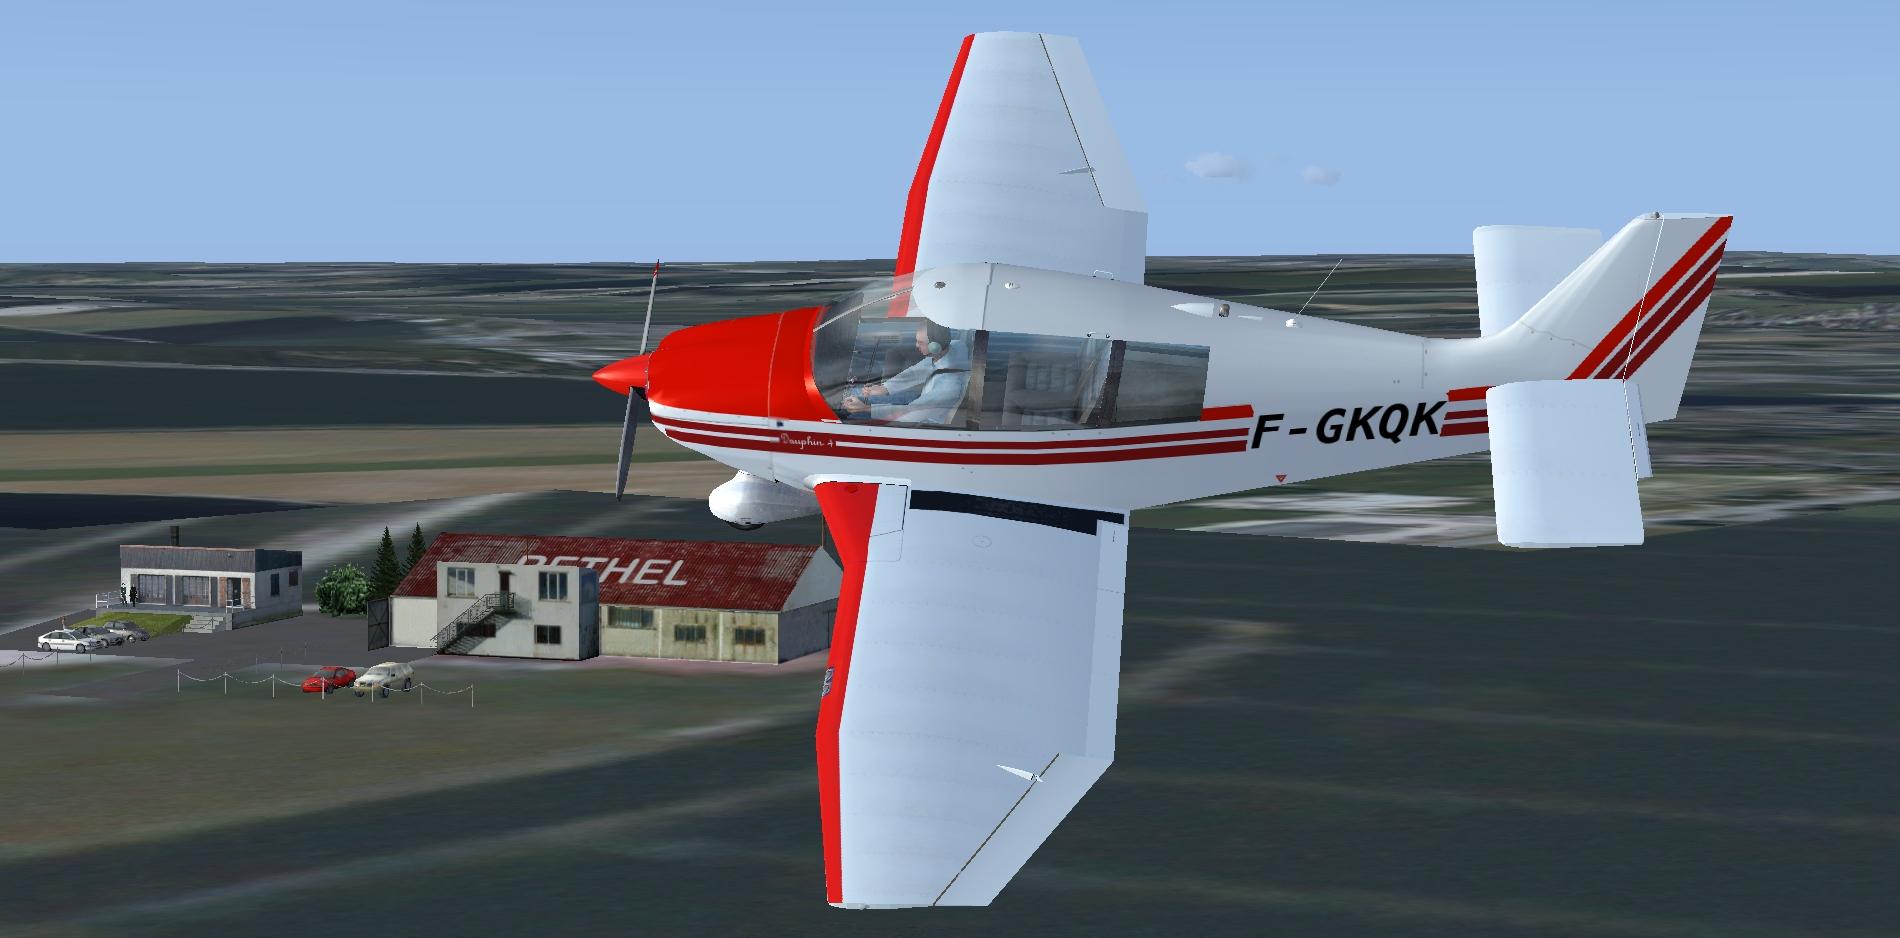 http://www.pilote-virtuel.com/img/members/8360/Nouveau-QK.jpeg